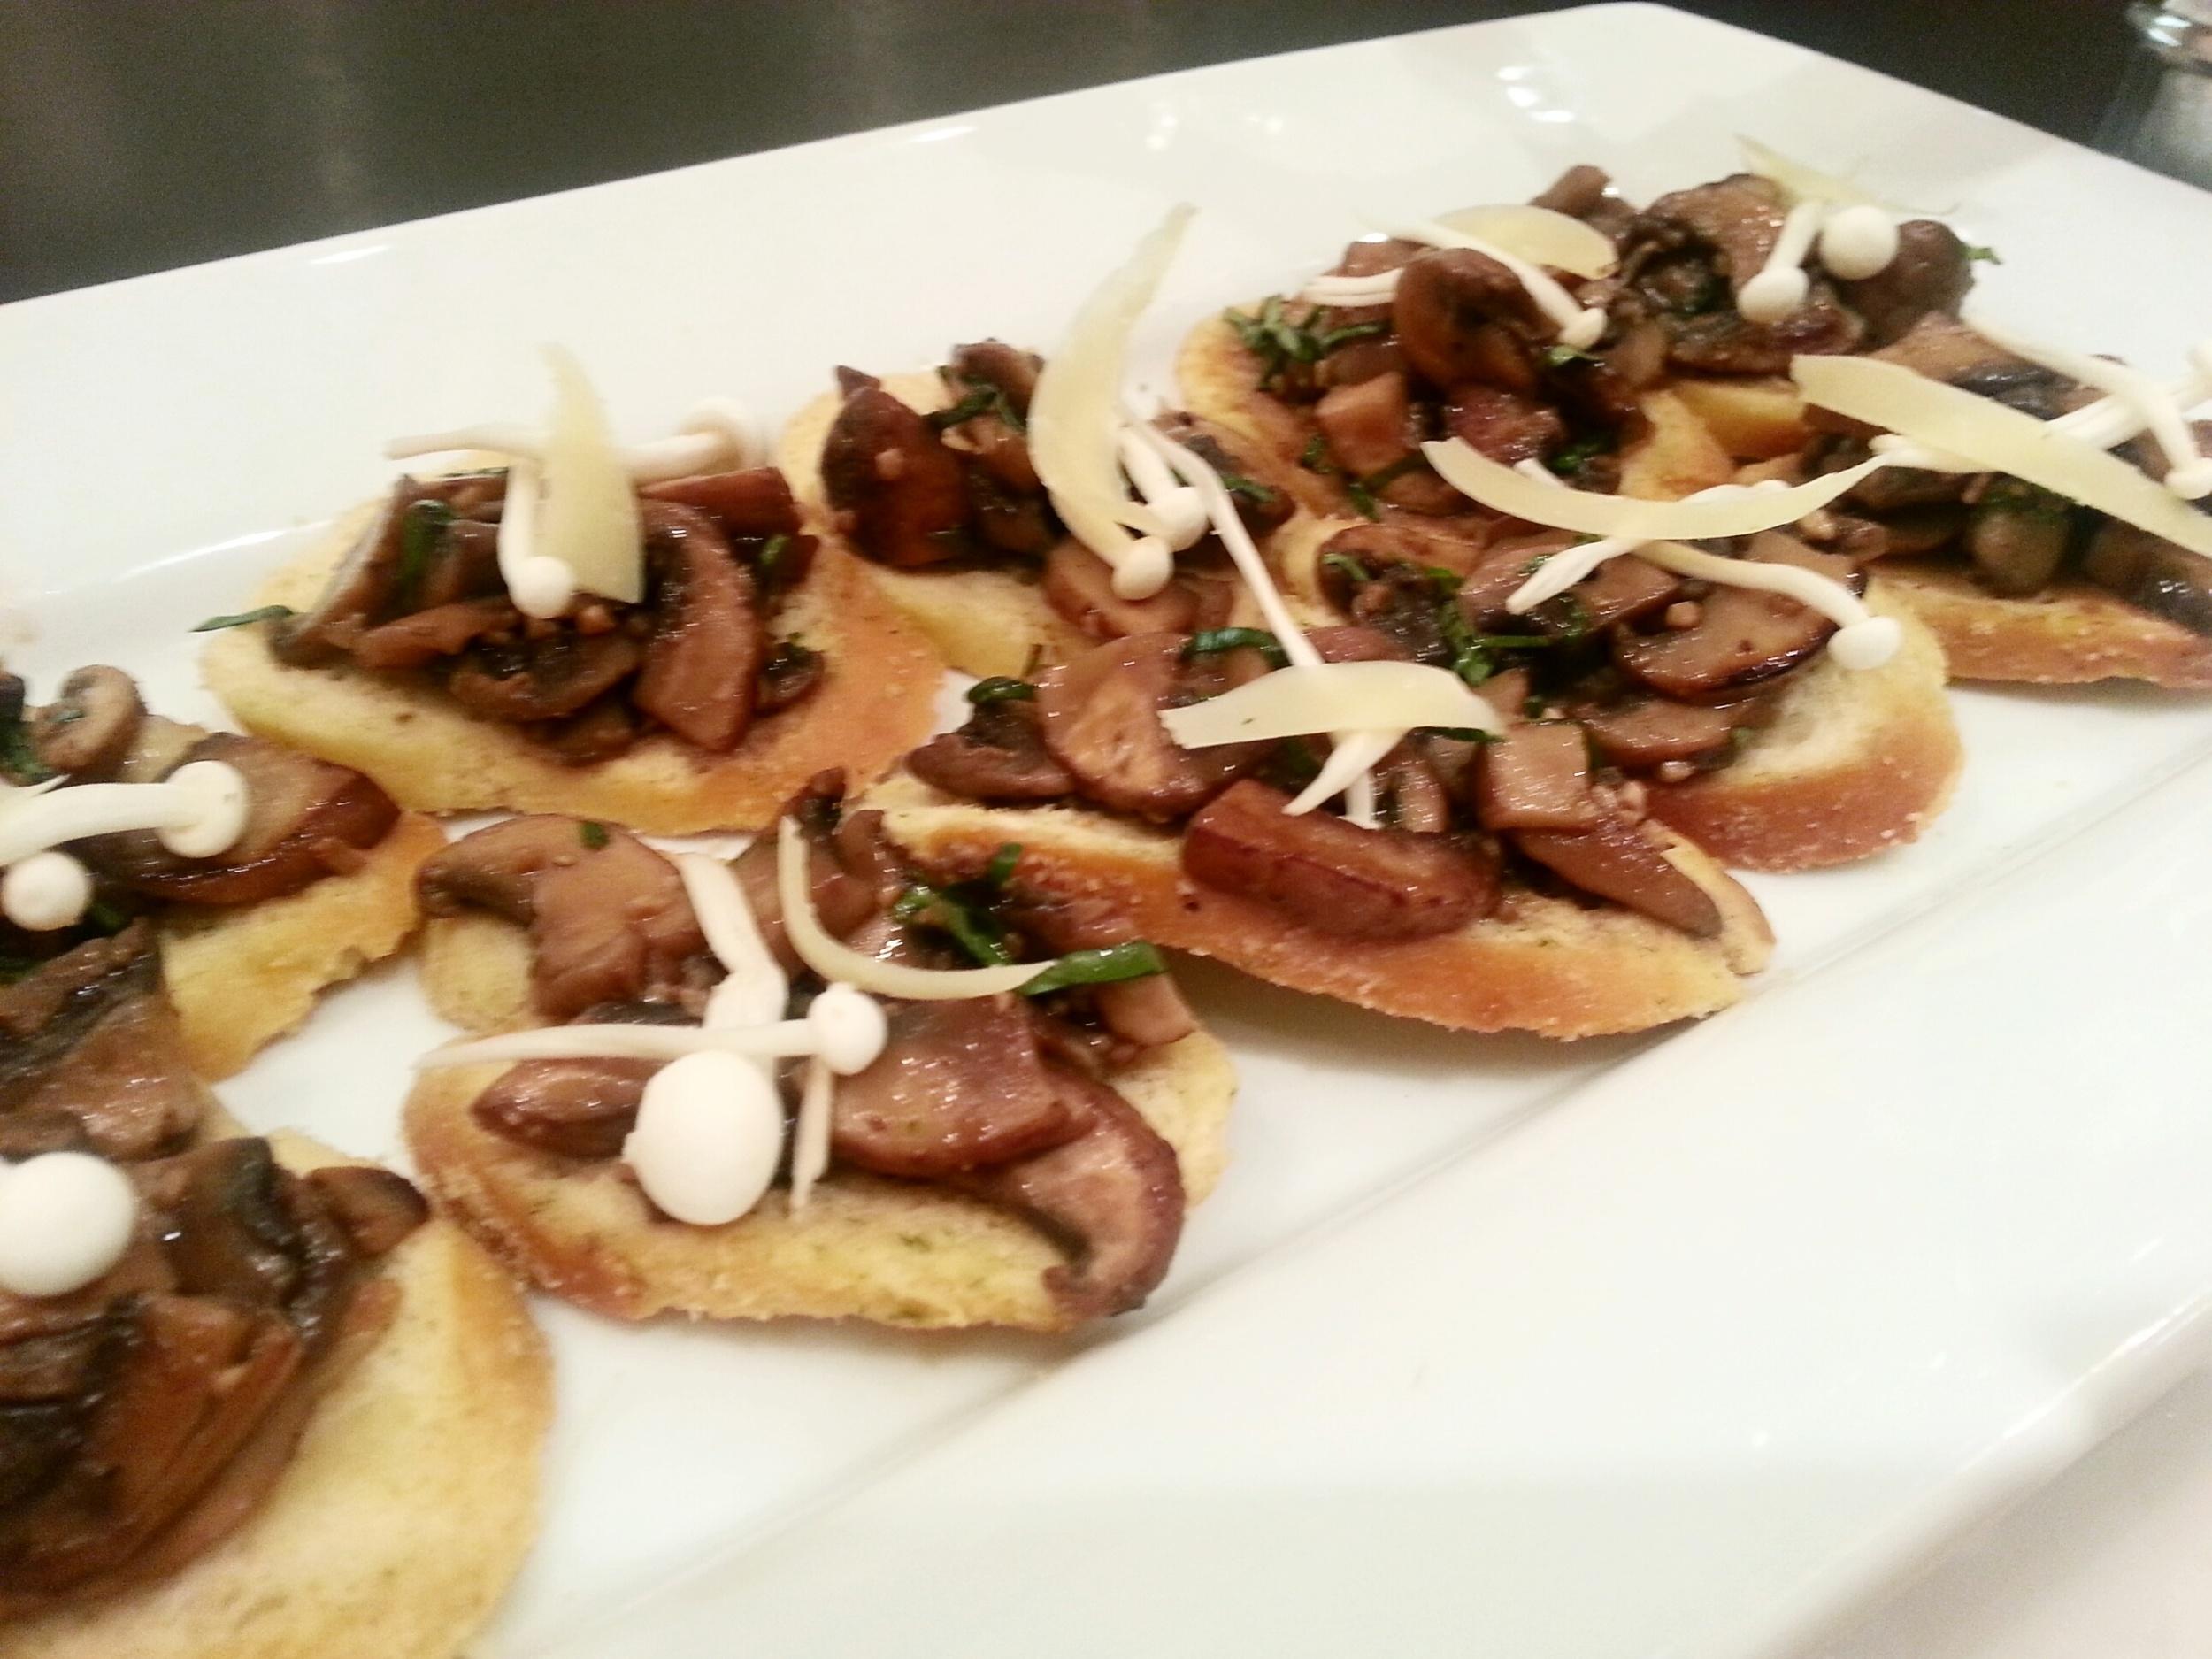 Savoury Mushroom Toasts with Horseradish